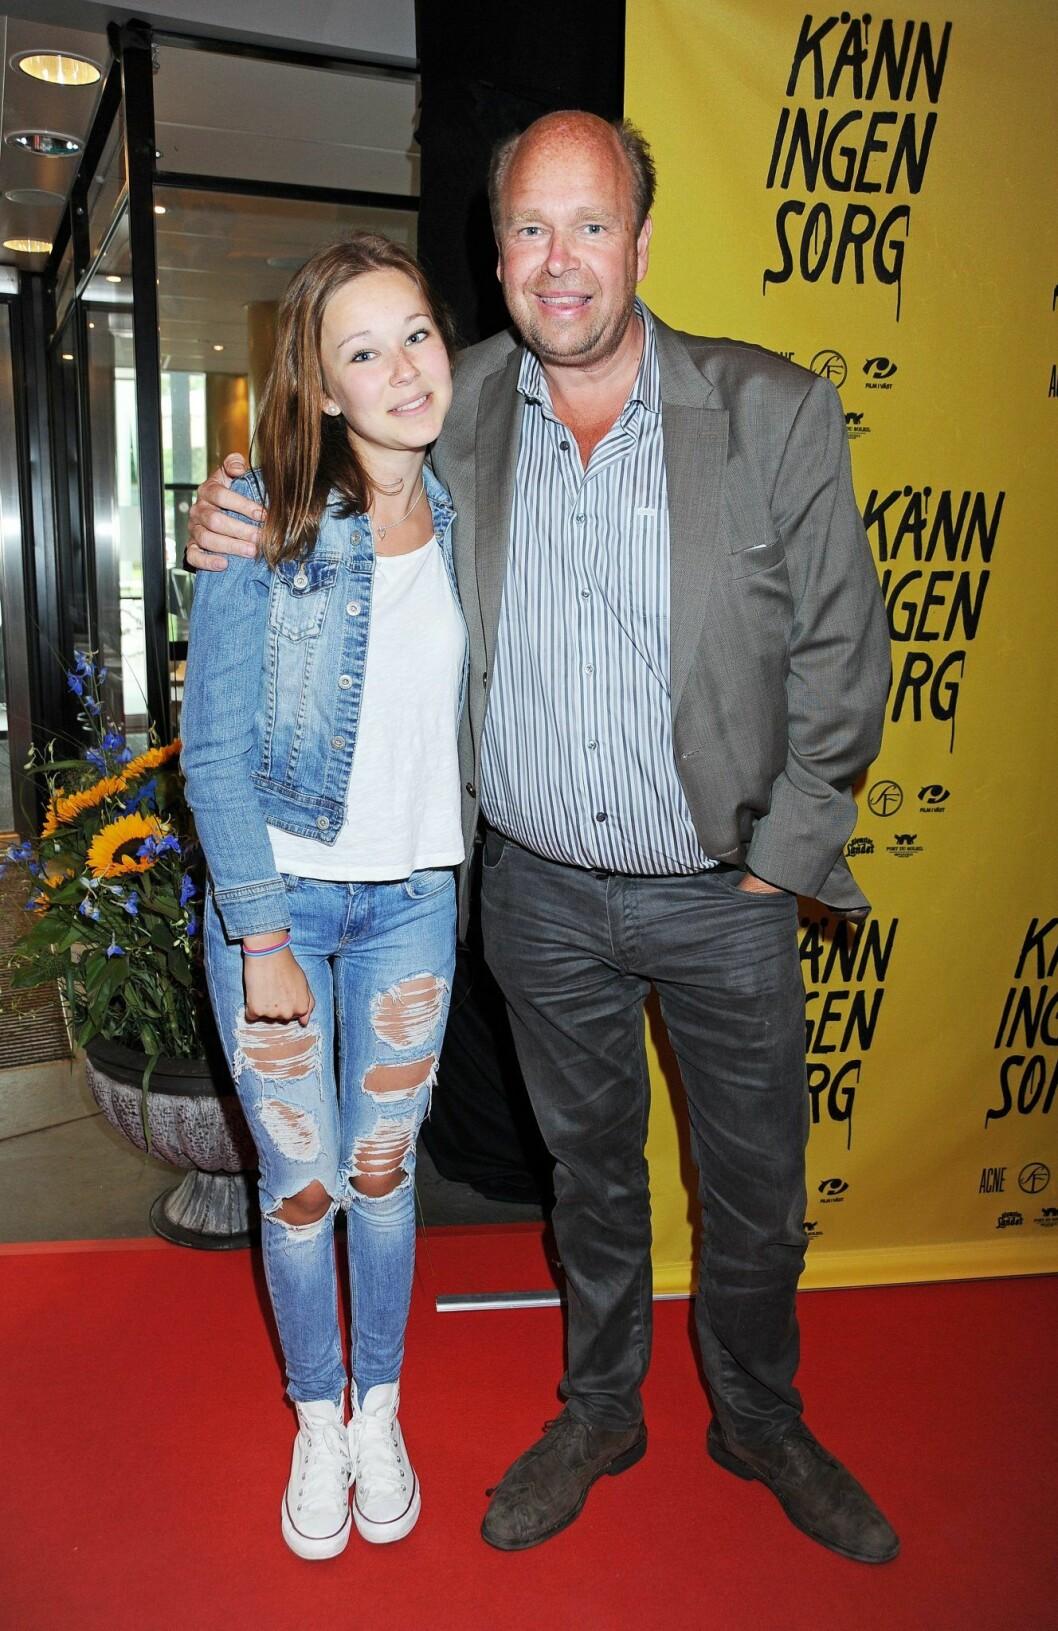 Lasse och dottern Amalia